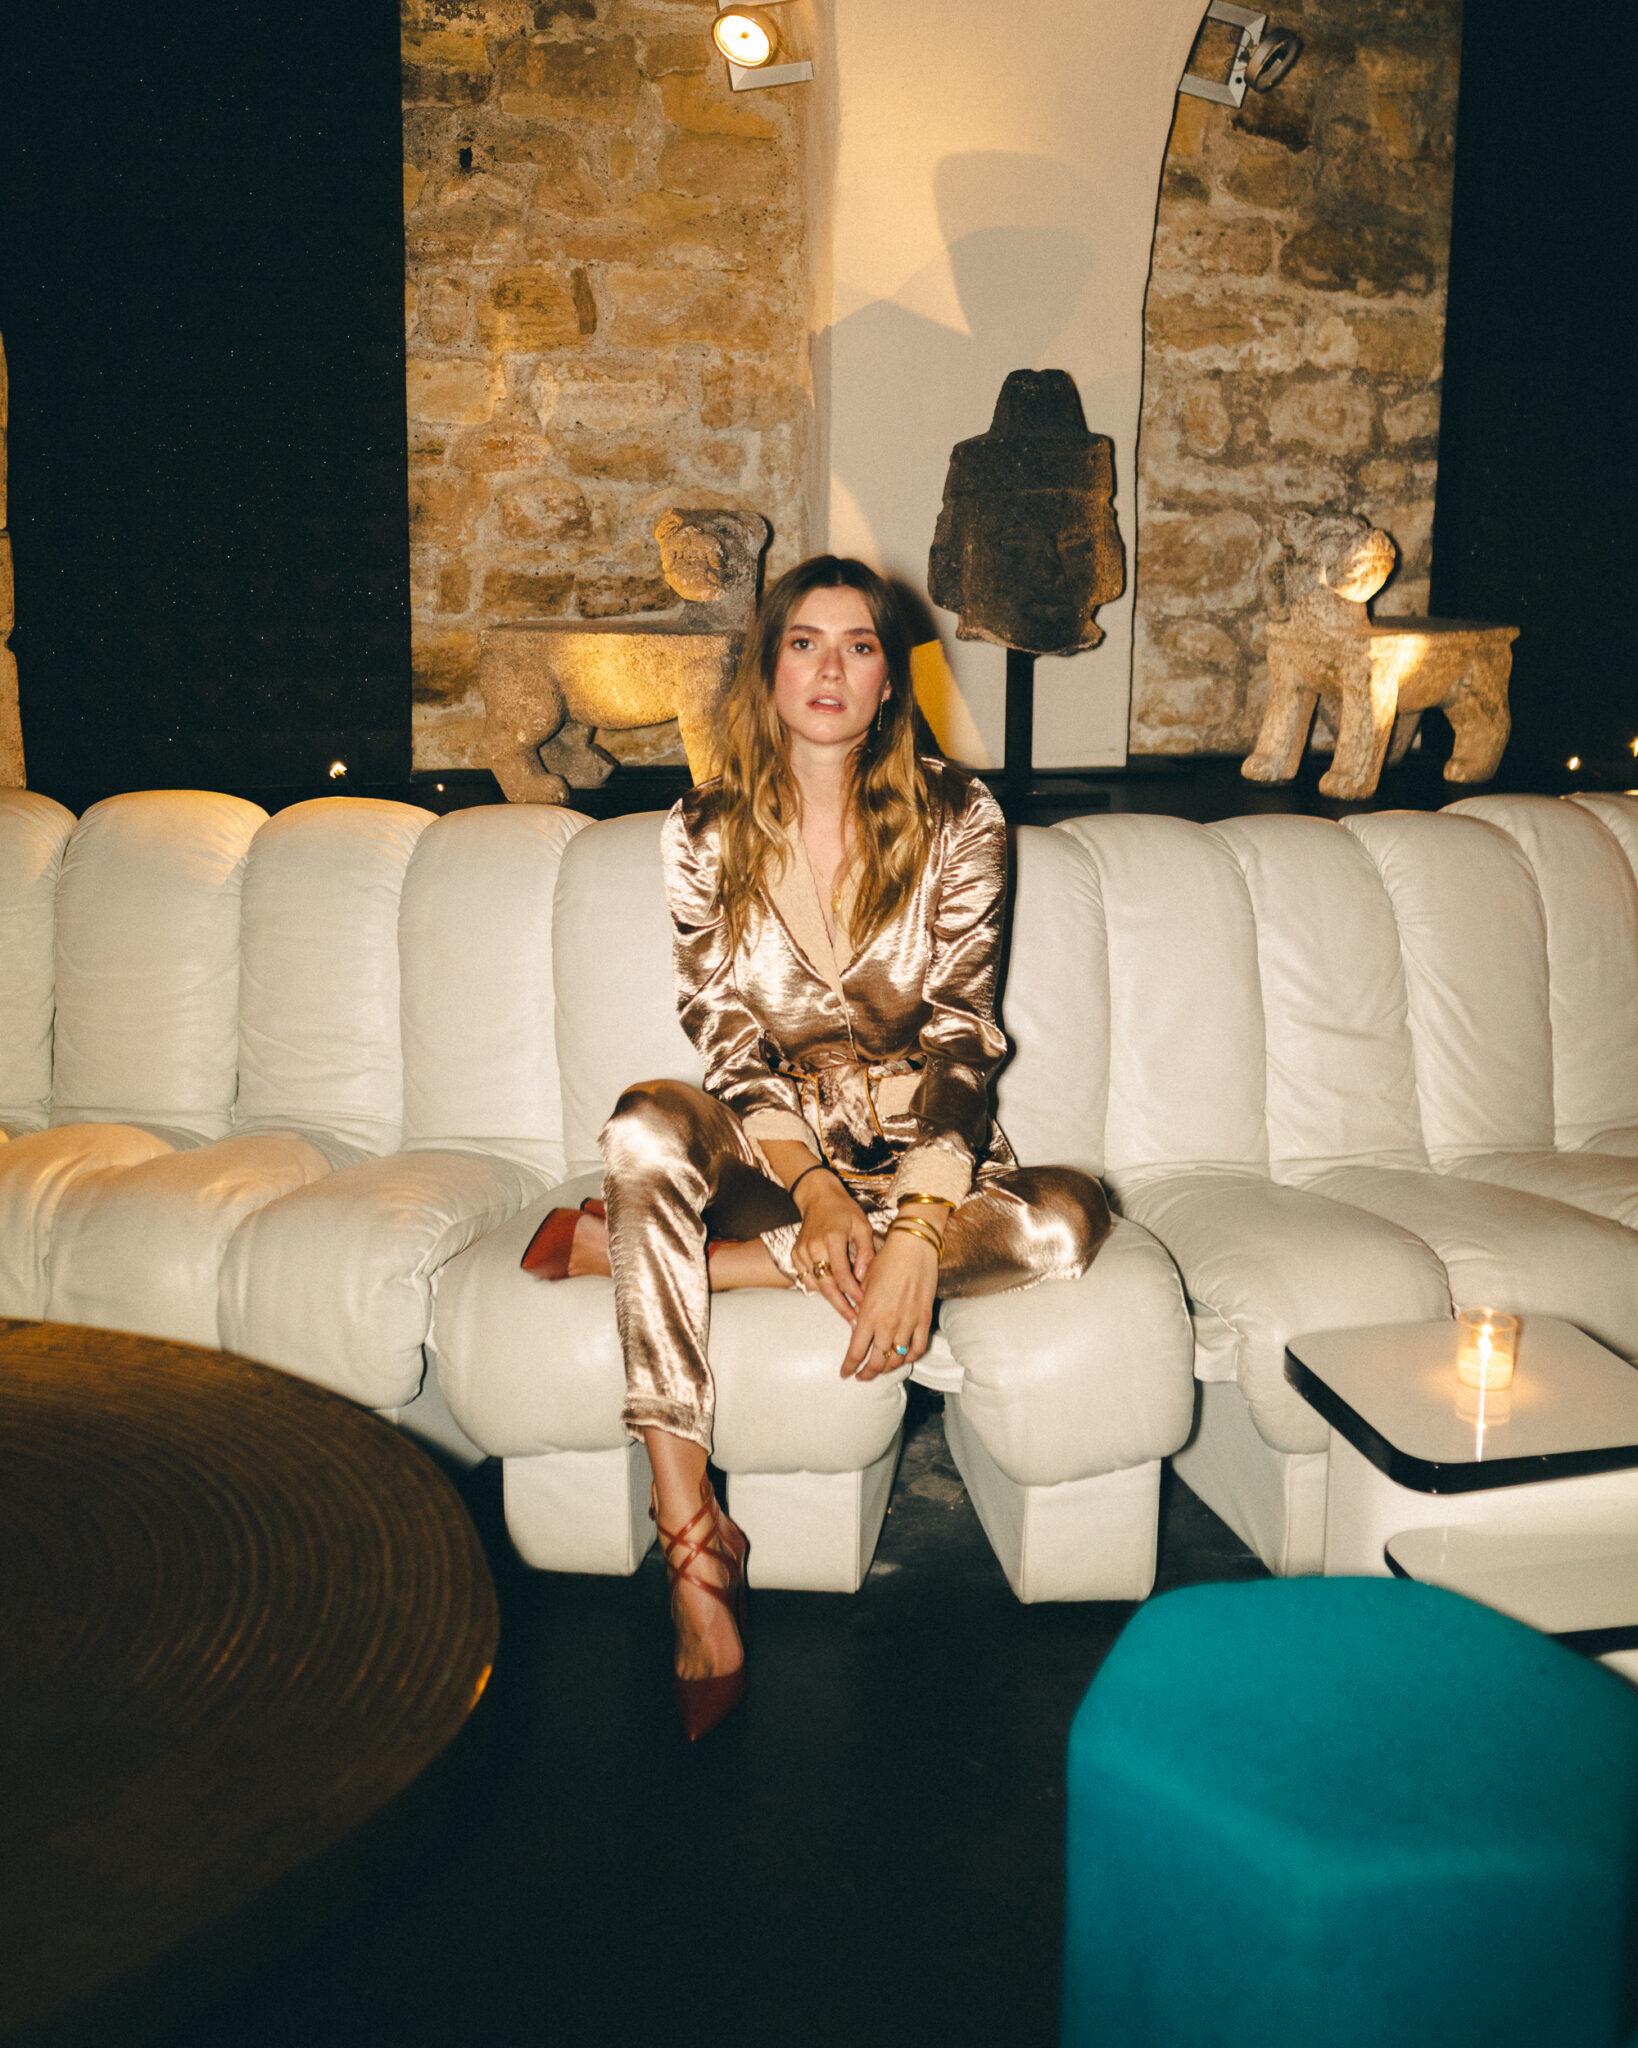 Zita d'Hauteville in Diana d'Orville luxury pale pink silk suit at Paris Fashion Week by Sam Richon